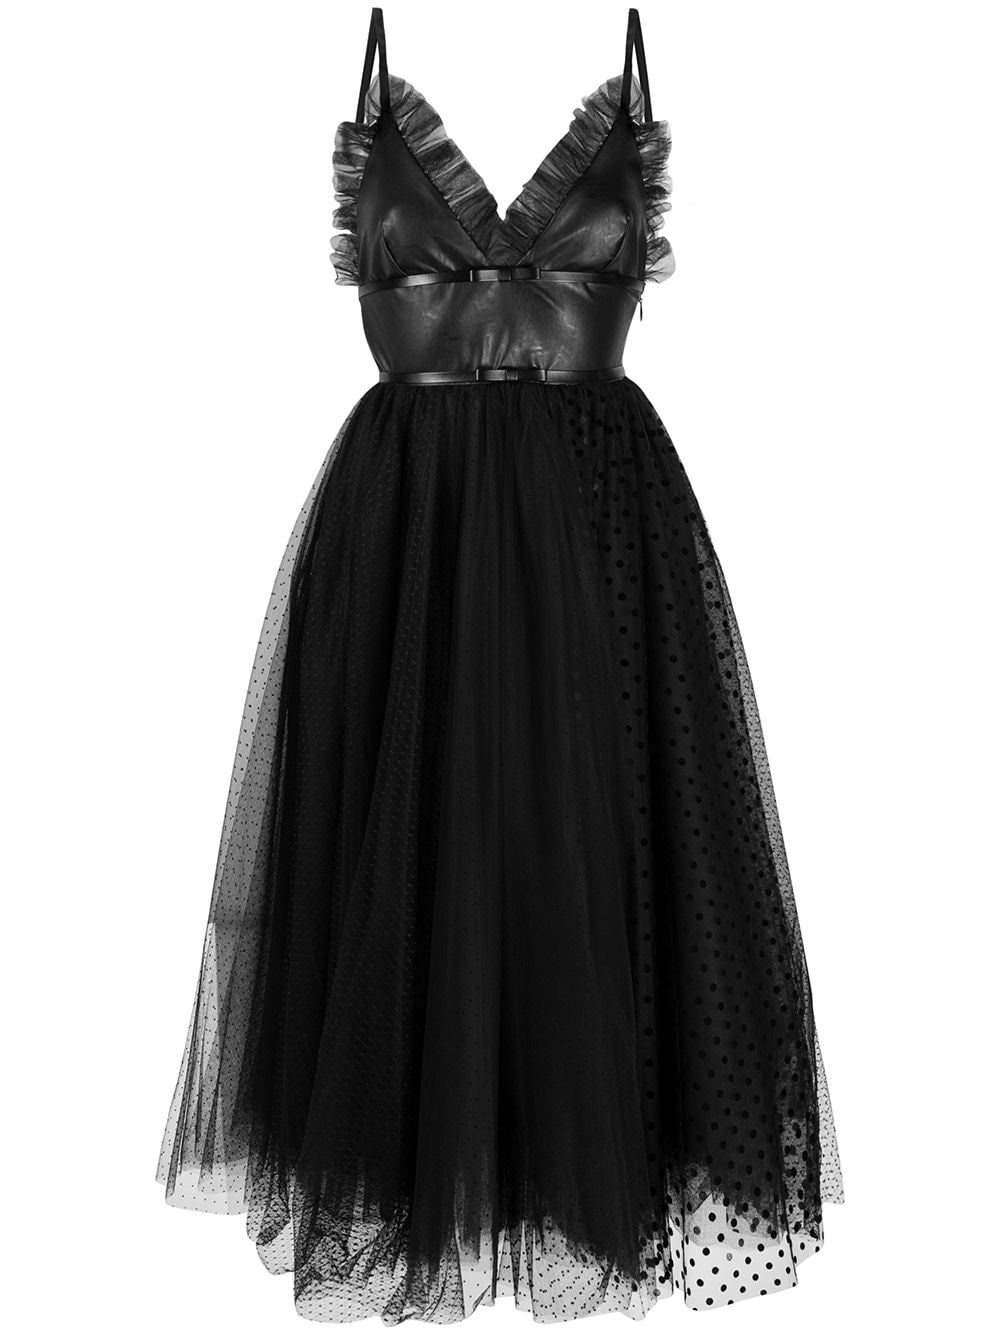 BROGNANO Ruffled Tulle Dress